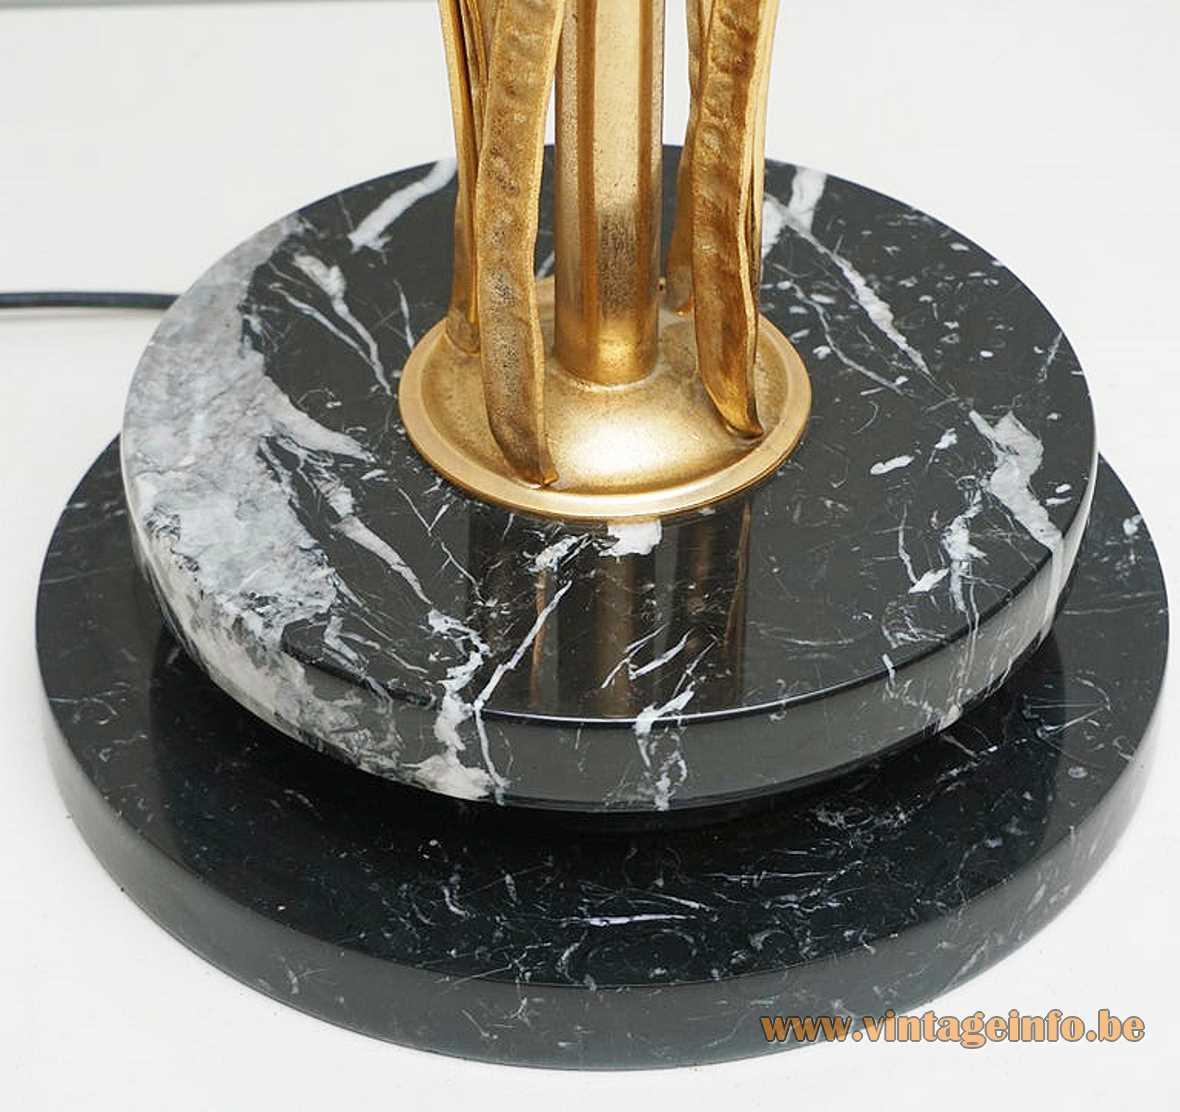 L'Originale herons floor lamp round black marble base brass birds & bulrush reed 1970s 1980s Italy halogen